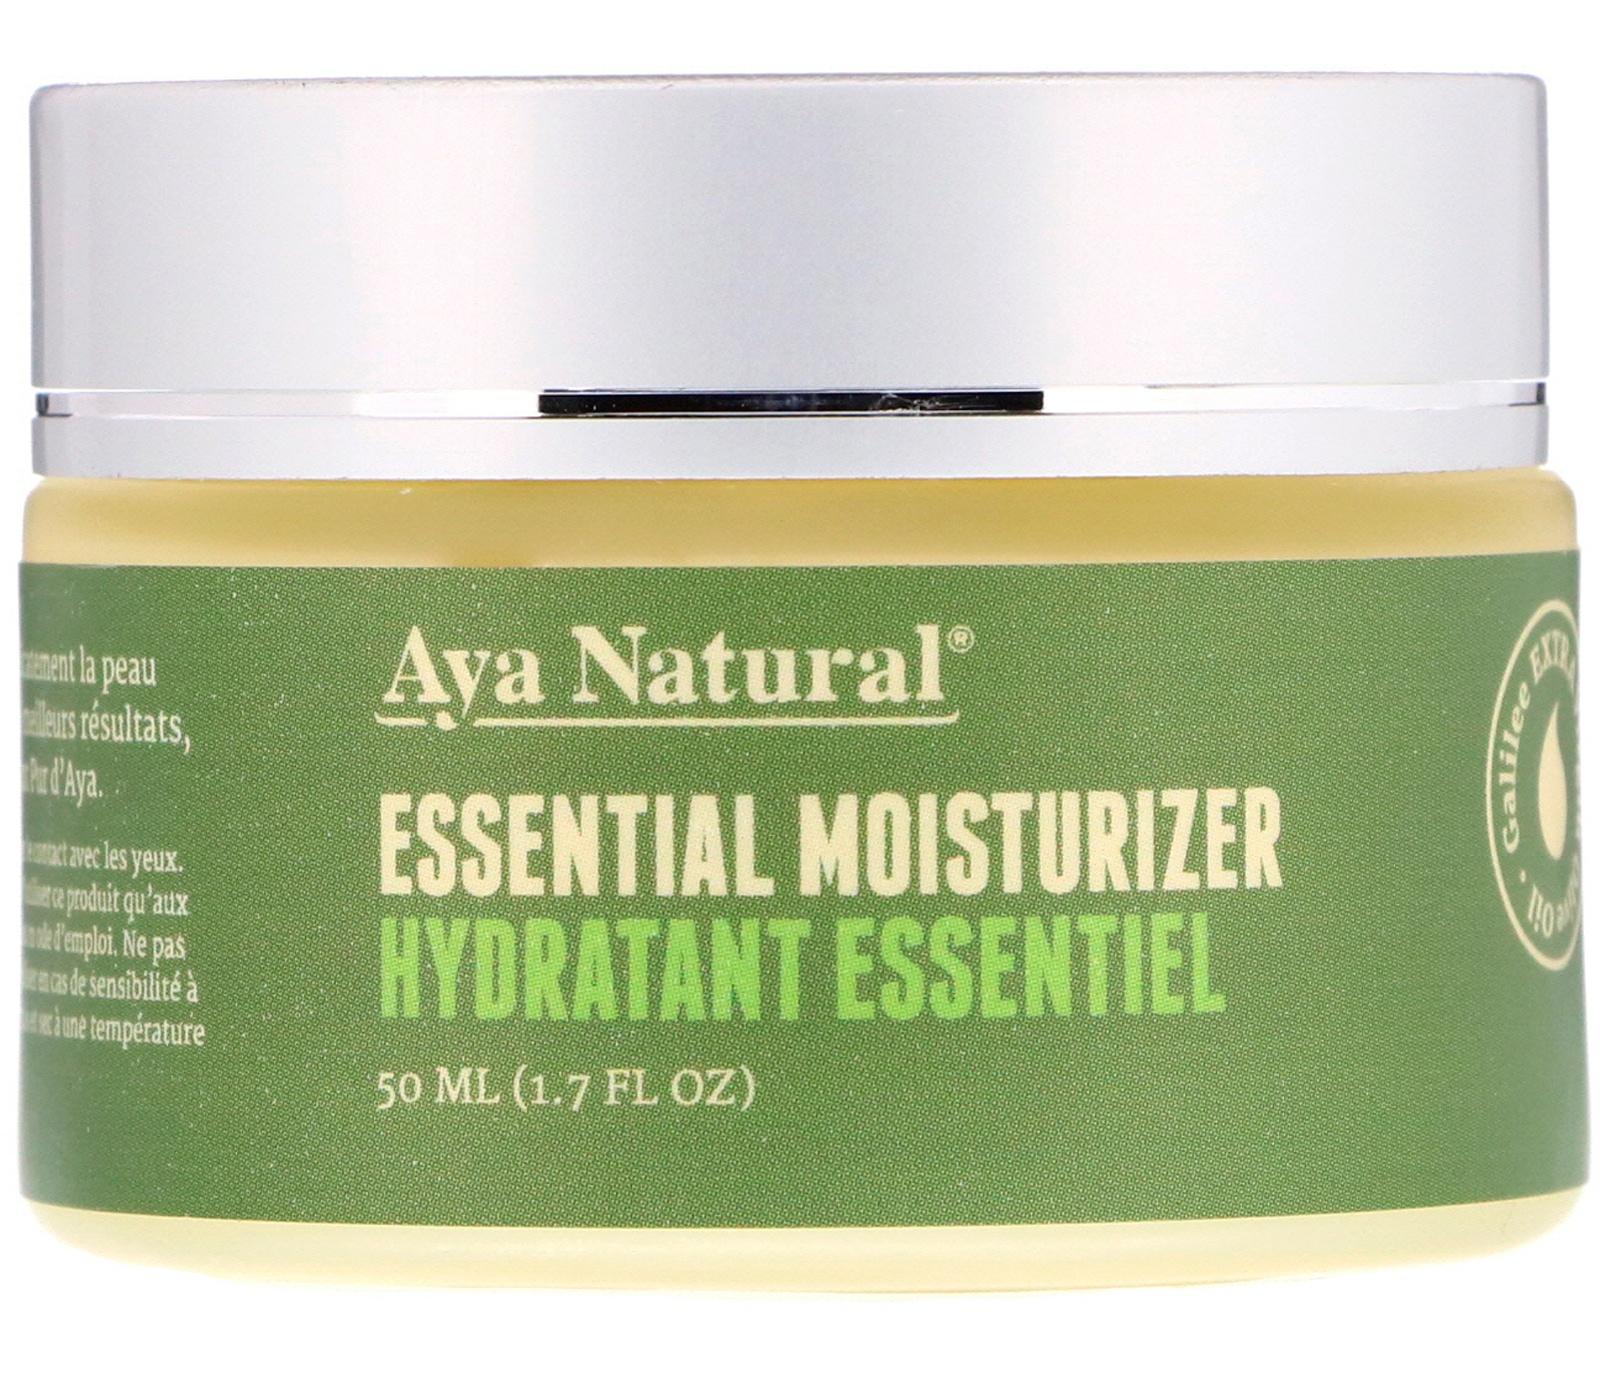 Aya Natural Essential Moisturizer